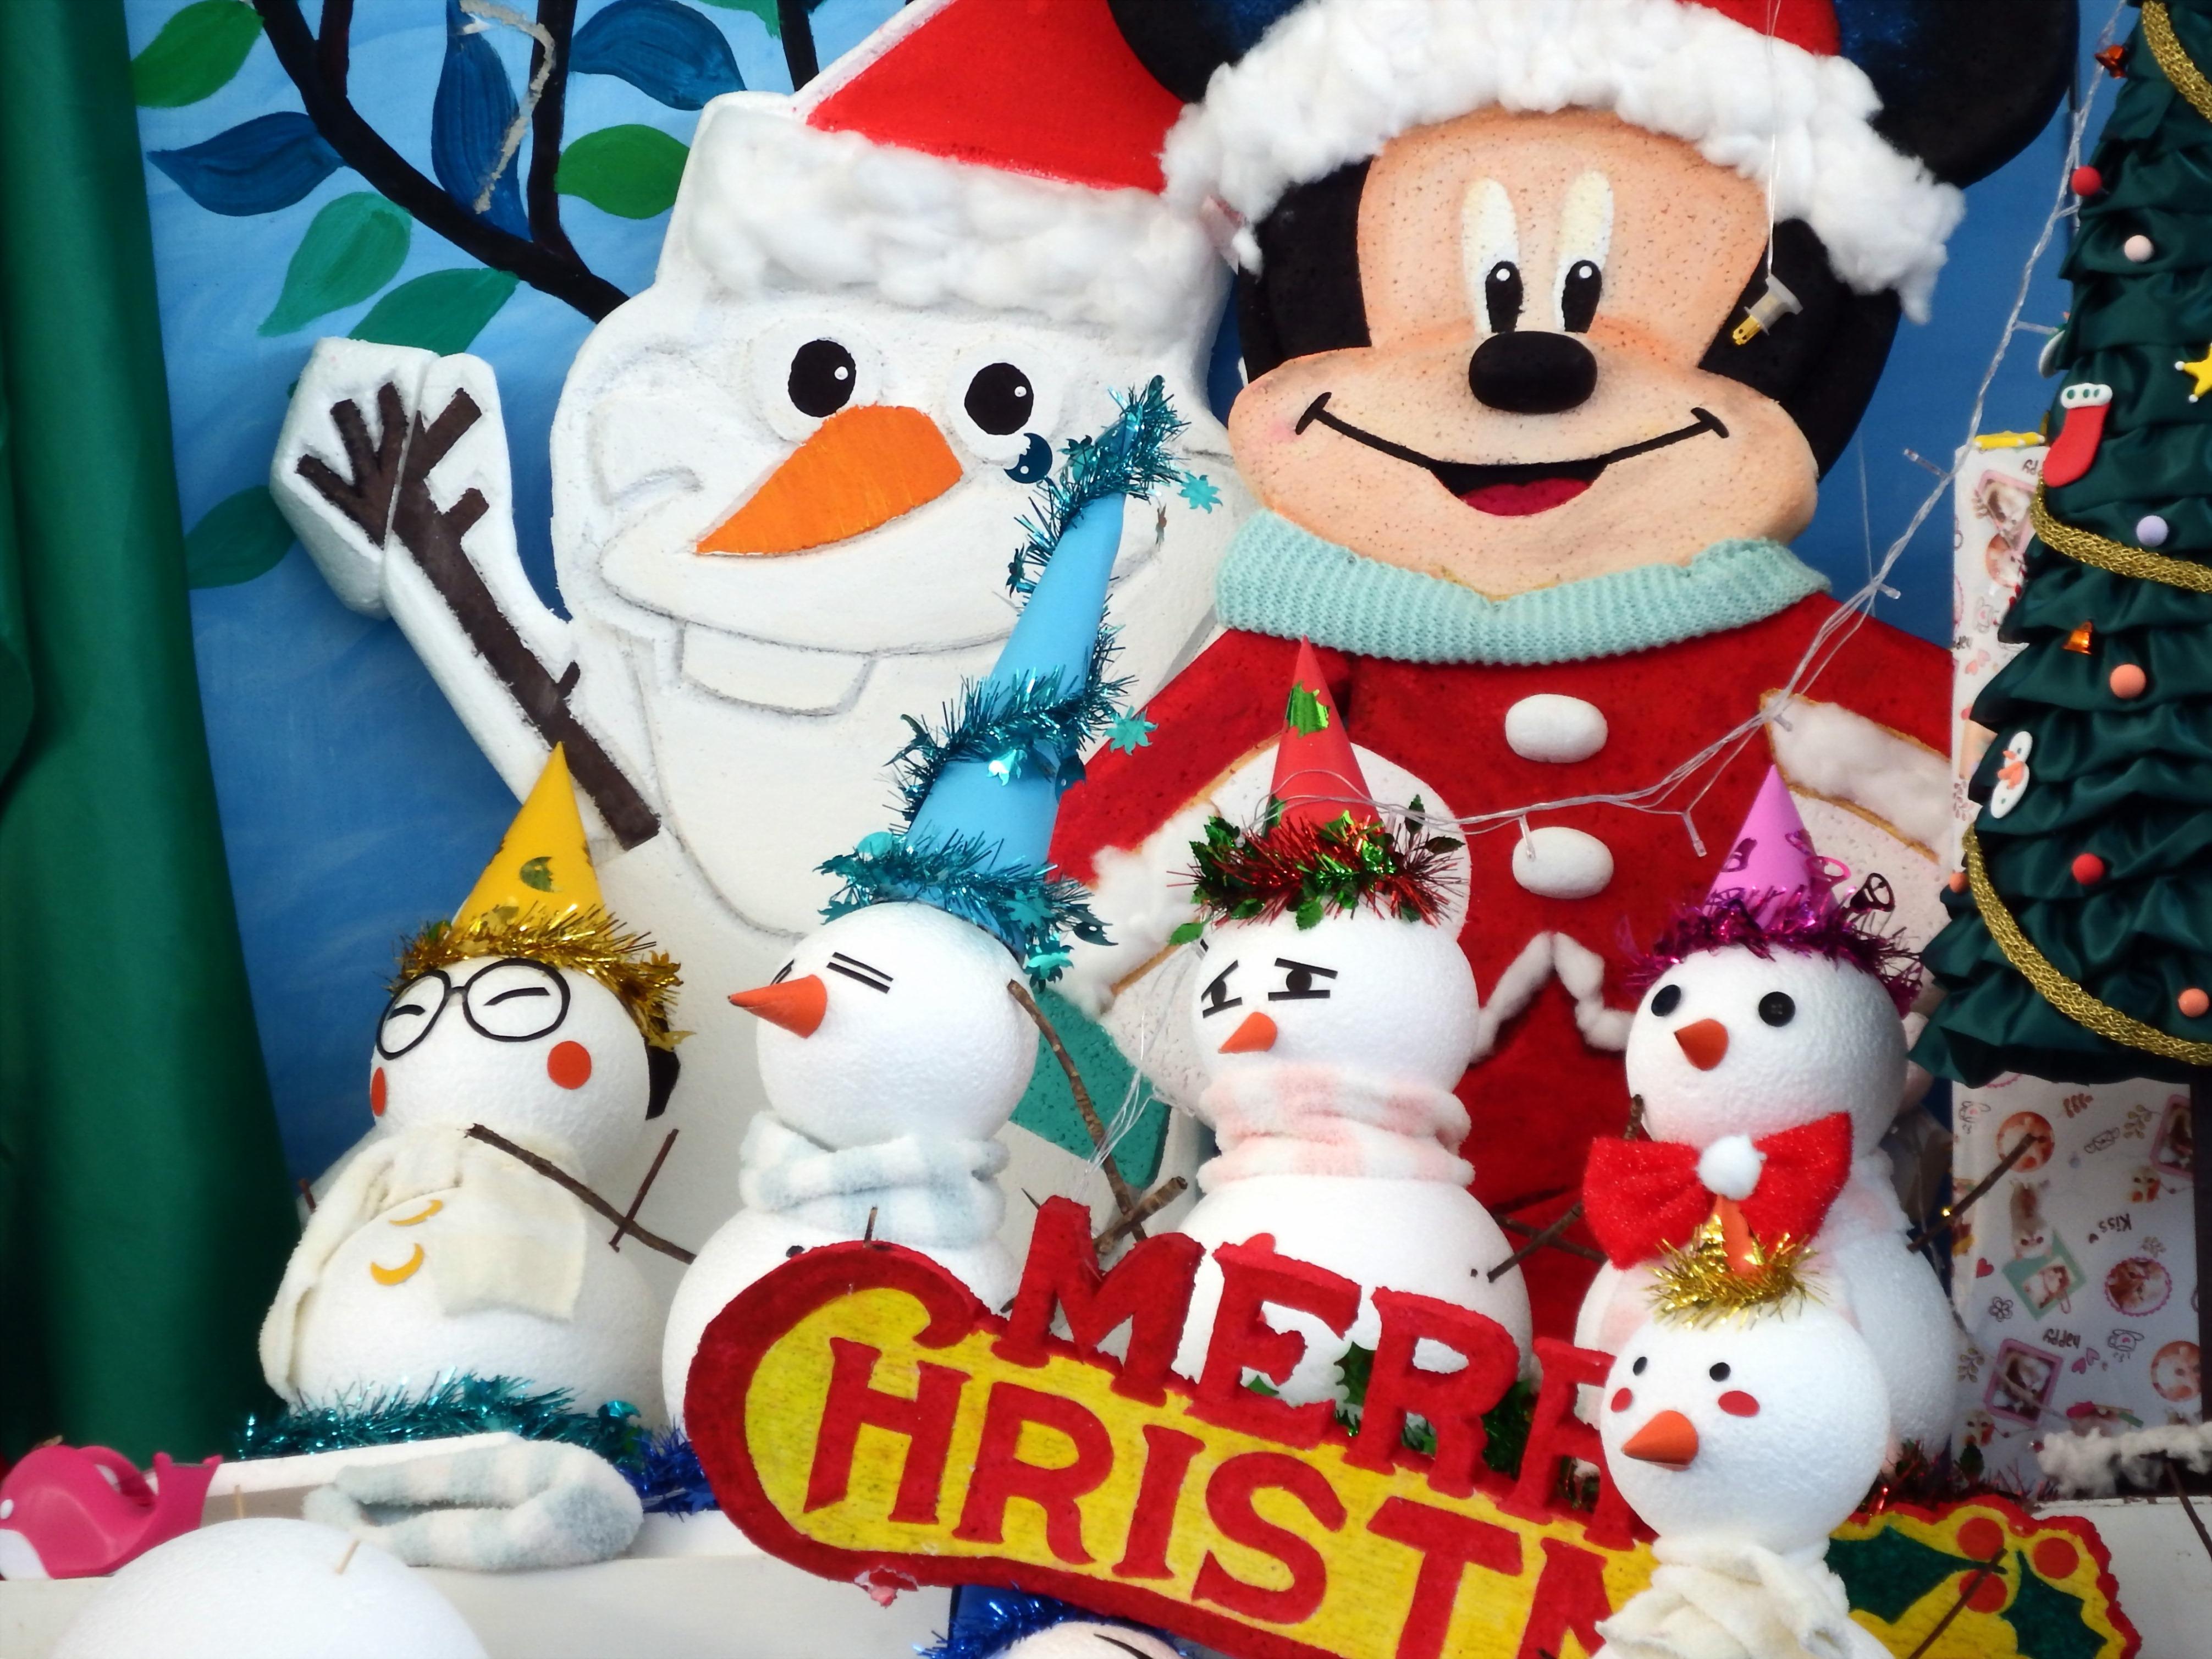 Mickey mouse disney christmas scene photo